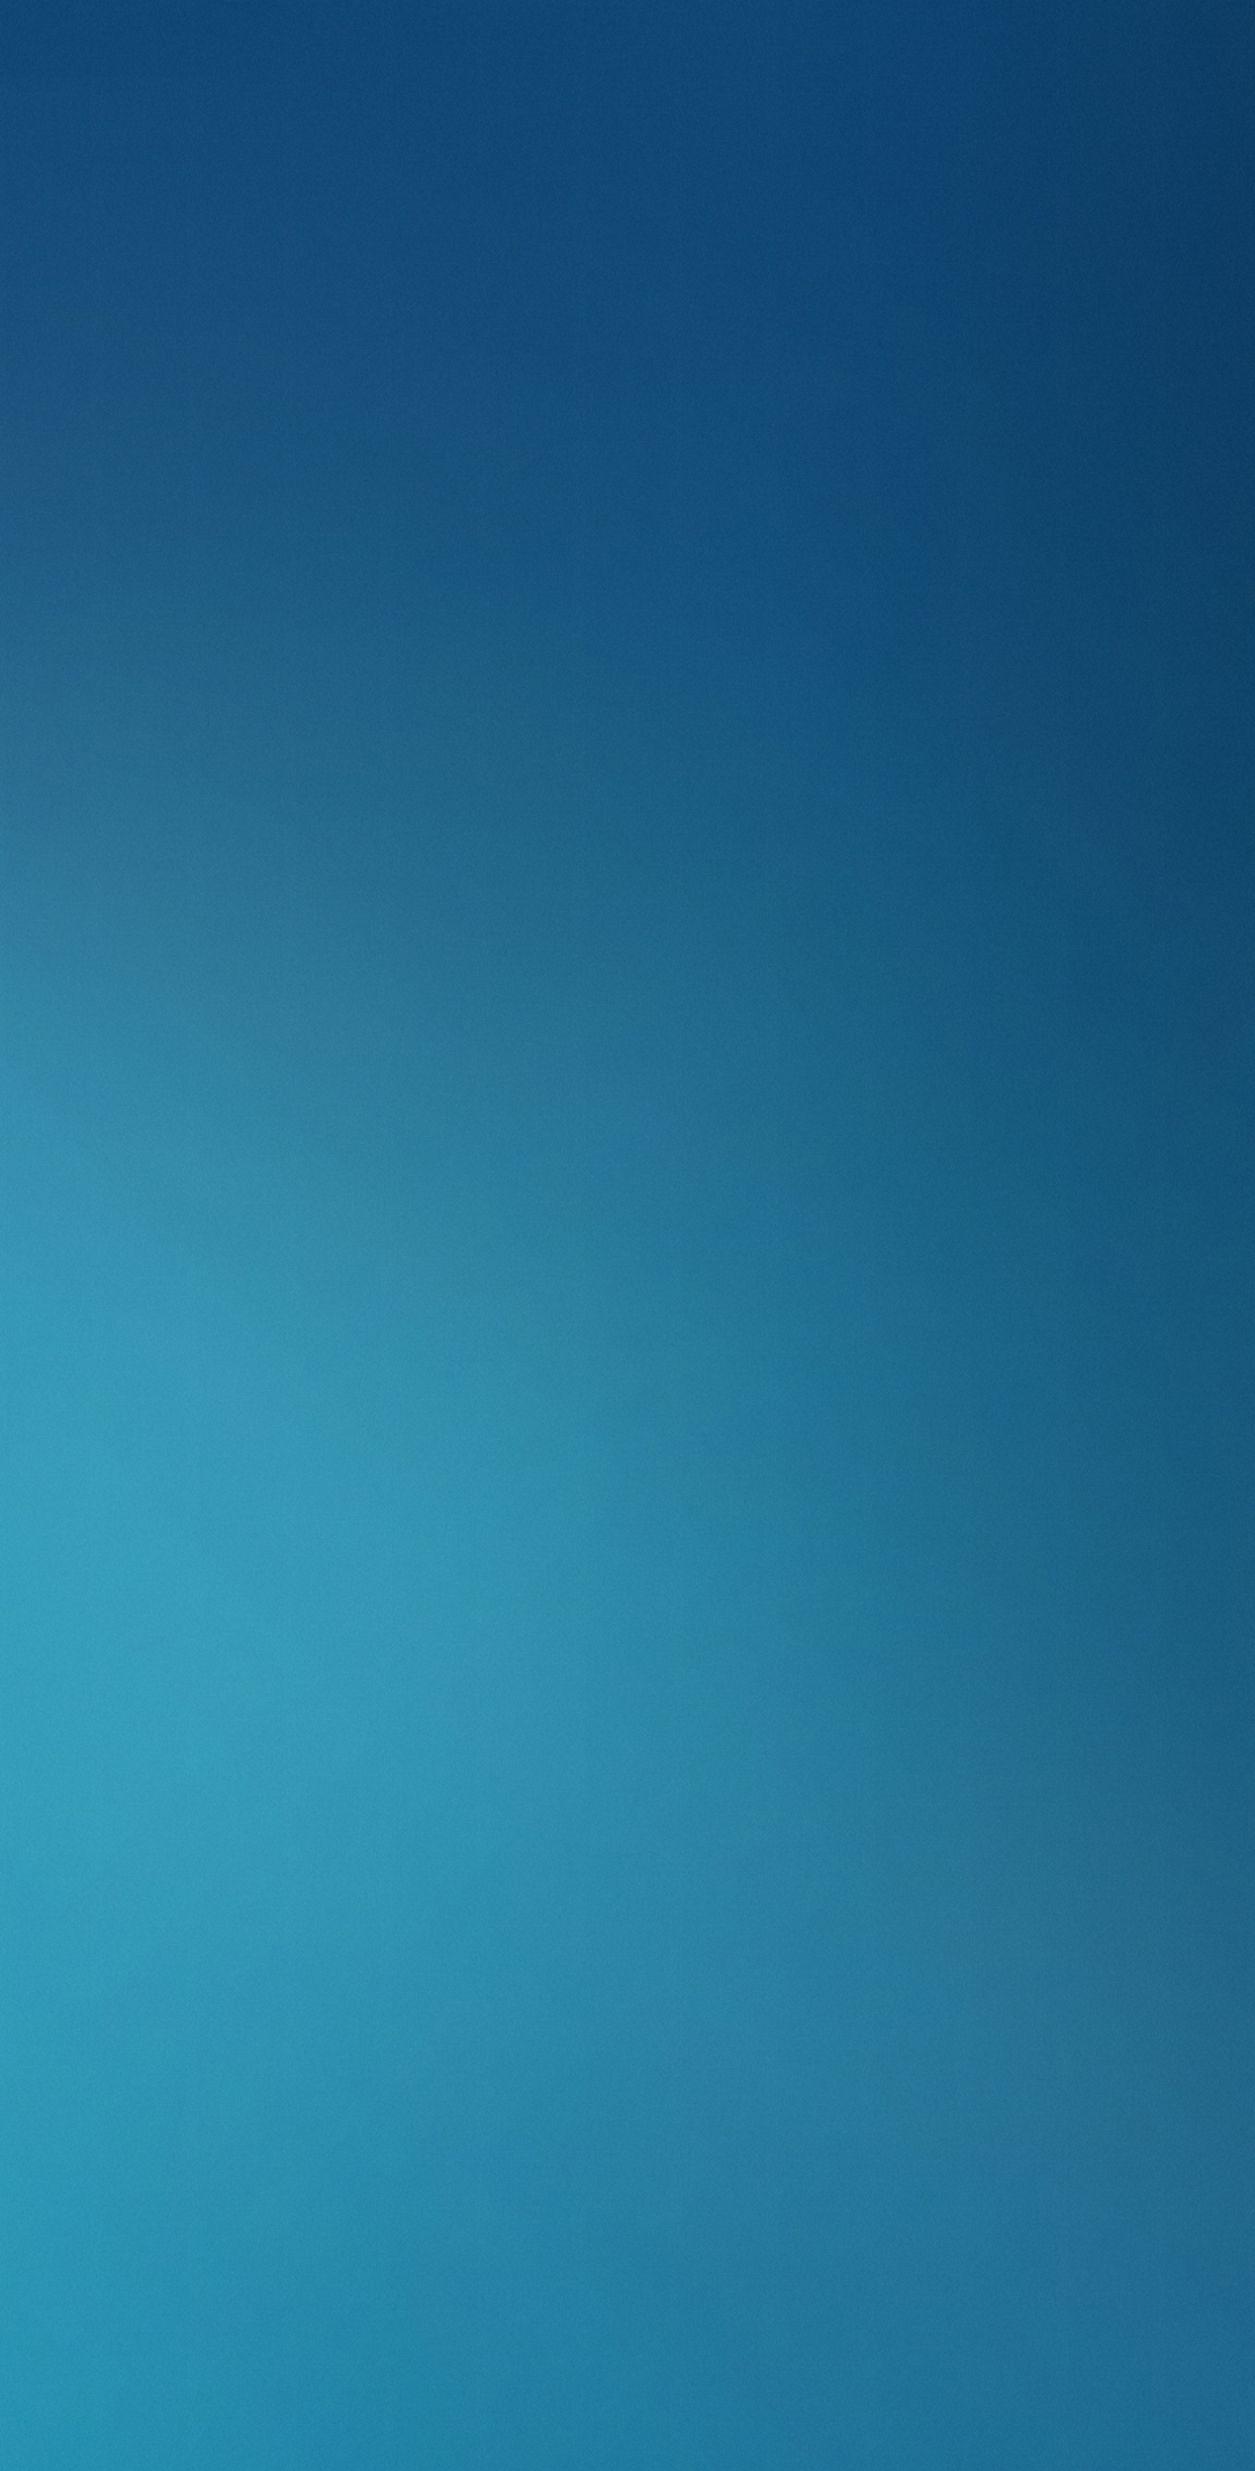 Blue Aqua Minimal Abstract Wallpaper Galaxy Clean Beauty Colour S8 Samsung